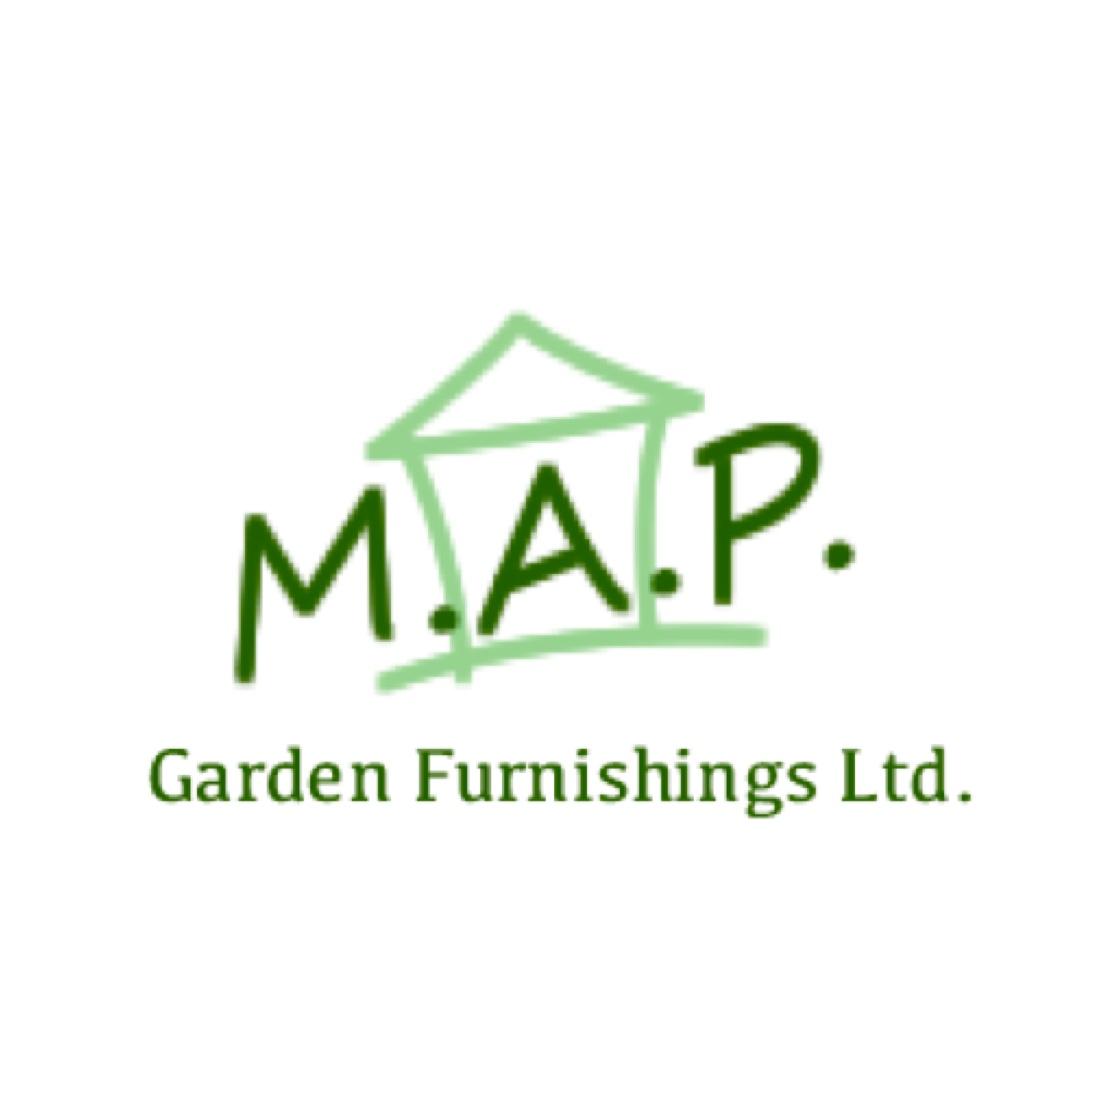 Protek Wood Stain & Protector - Beaumont Blue (1 litre)